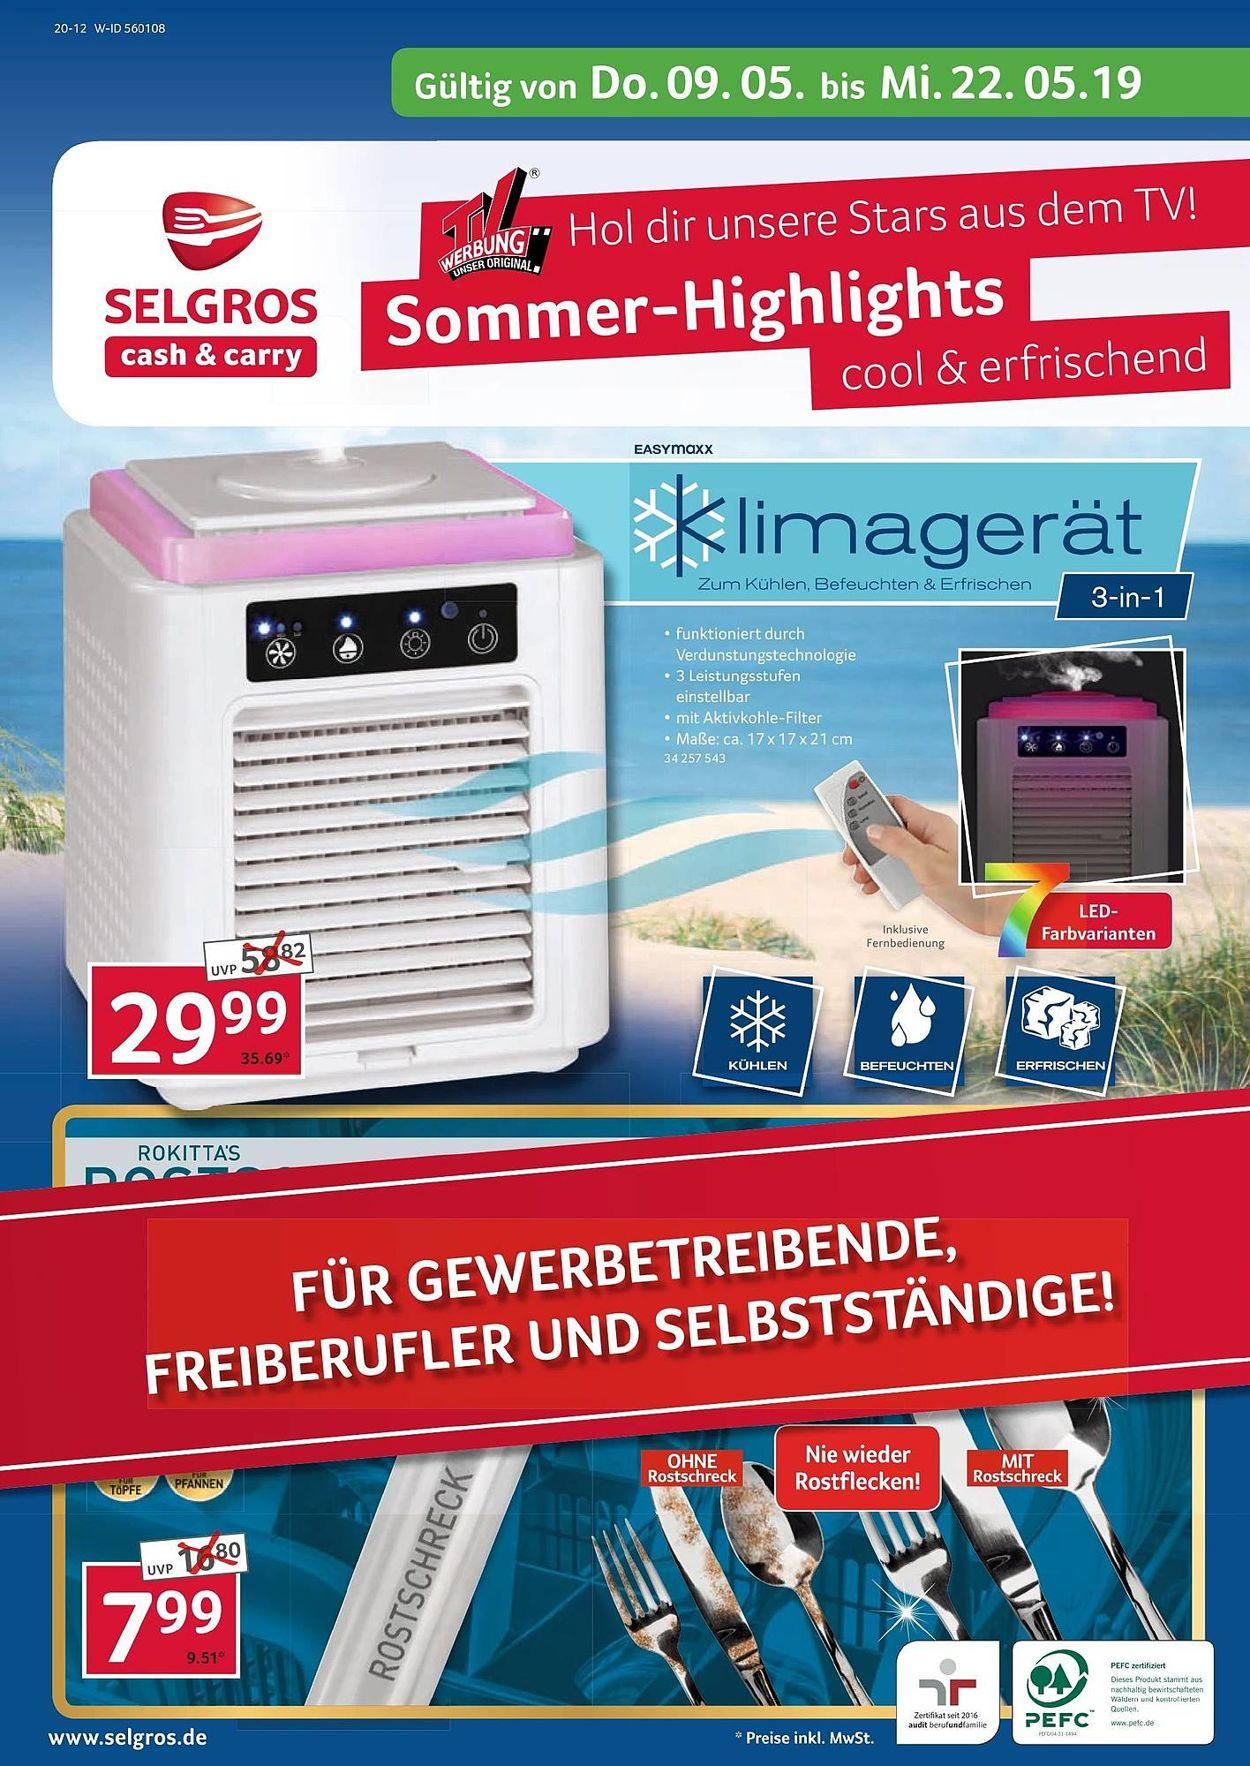 Selgros Prospekt - Aktuell vom 09.05-22.05.2019